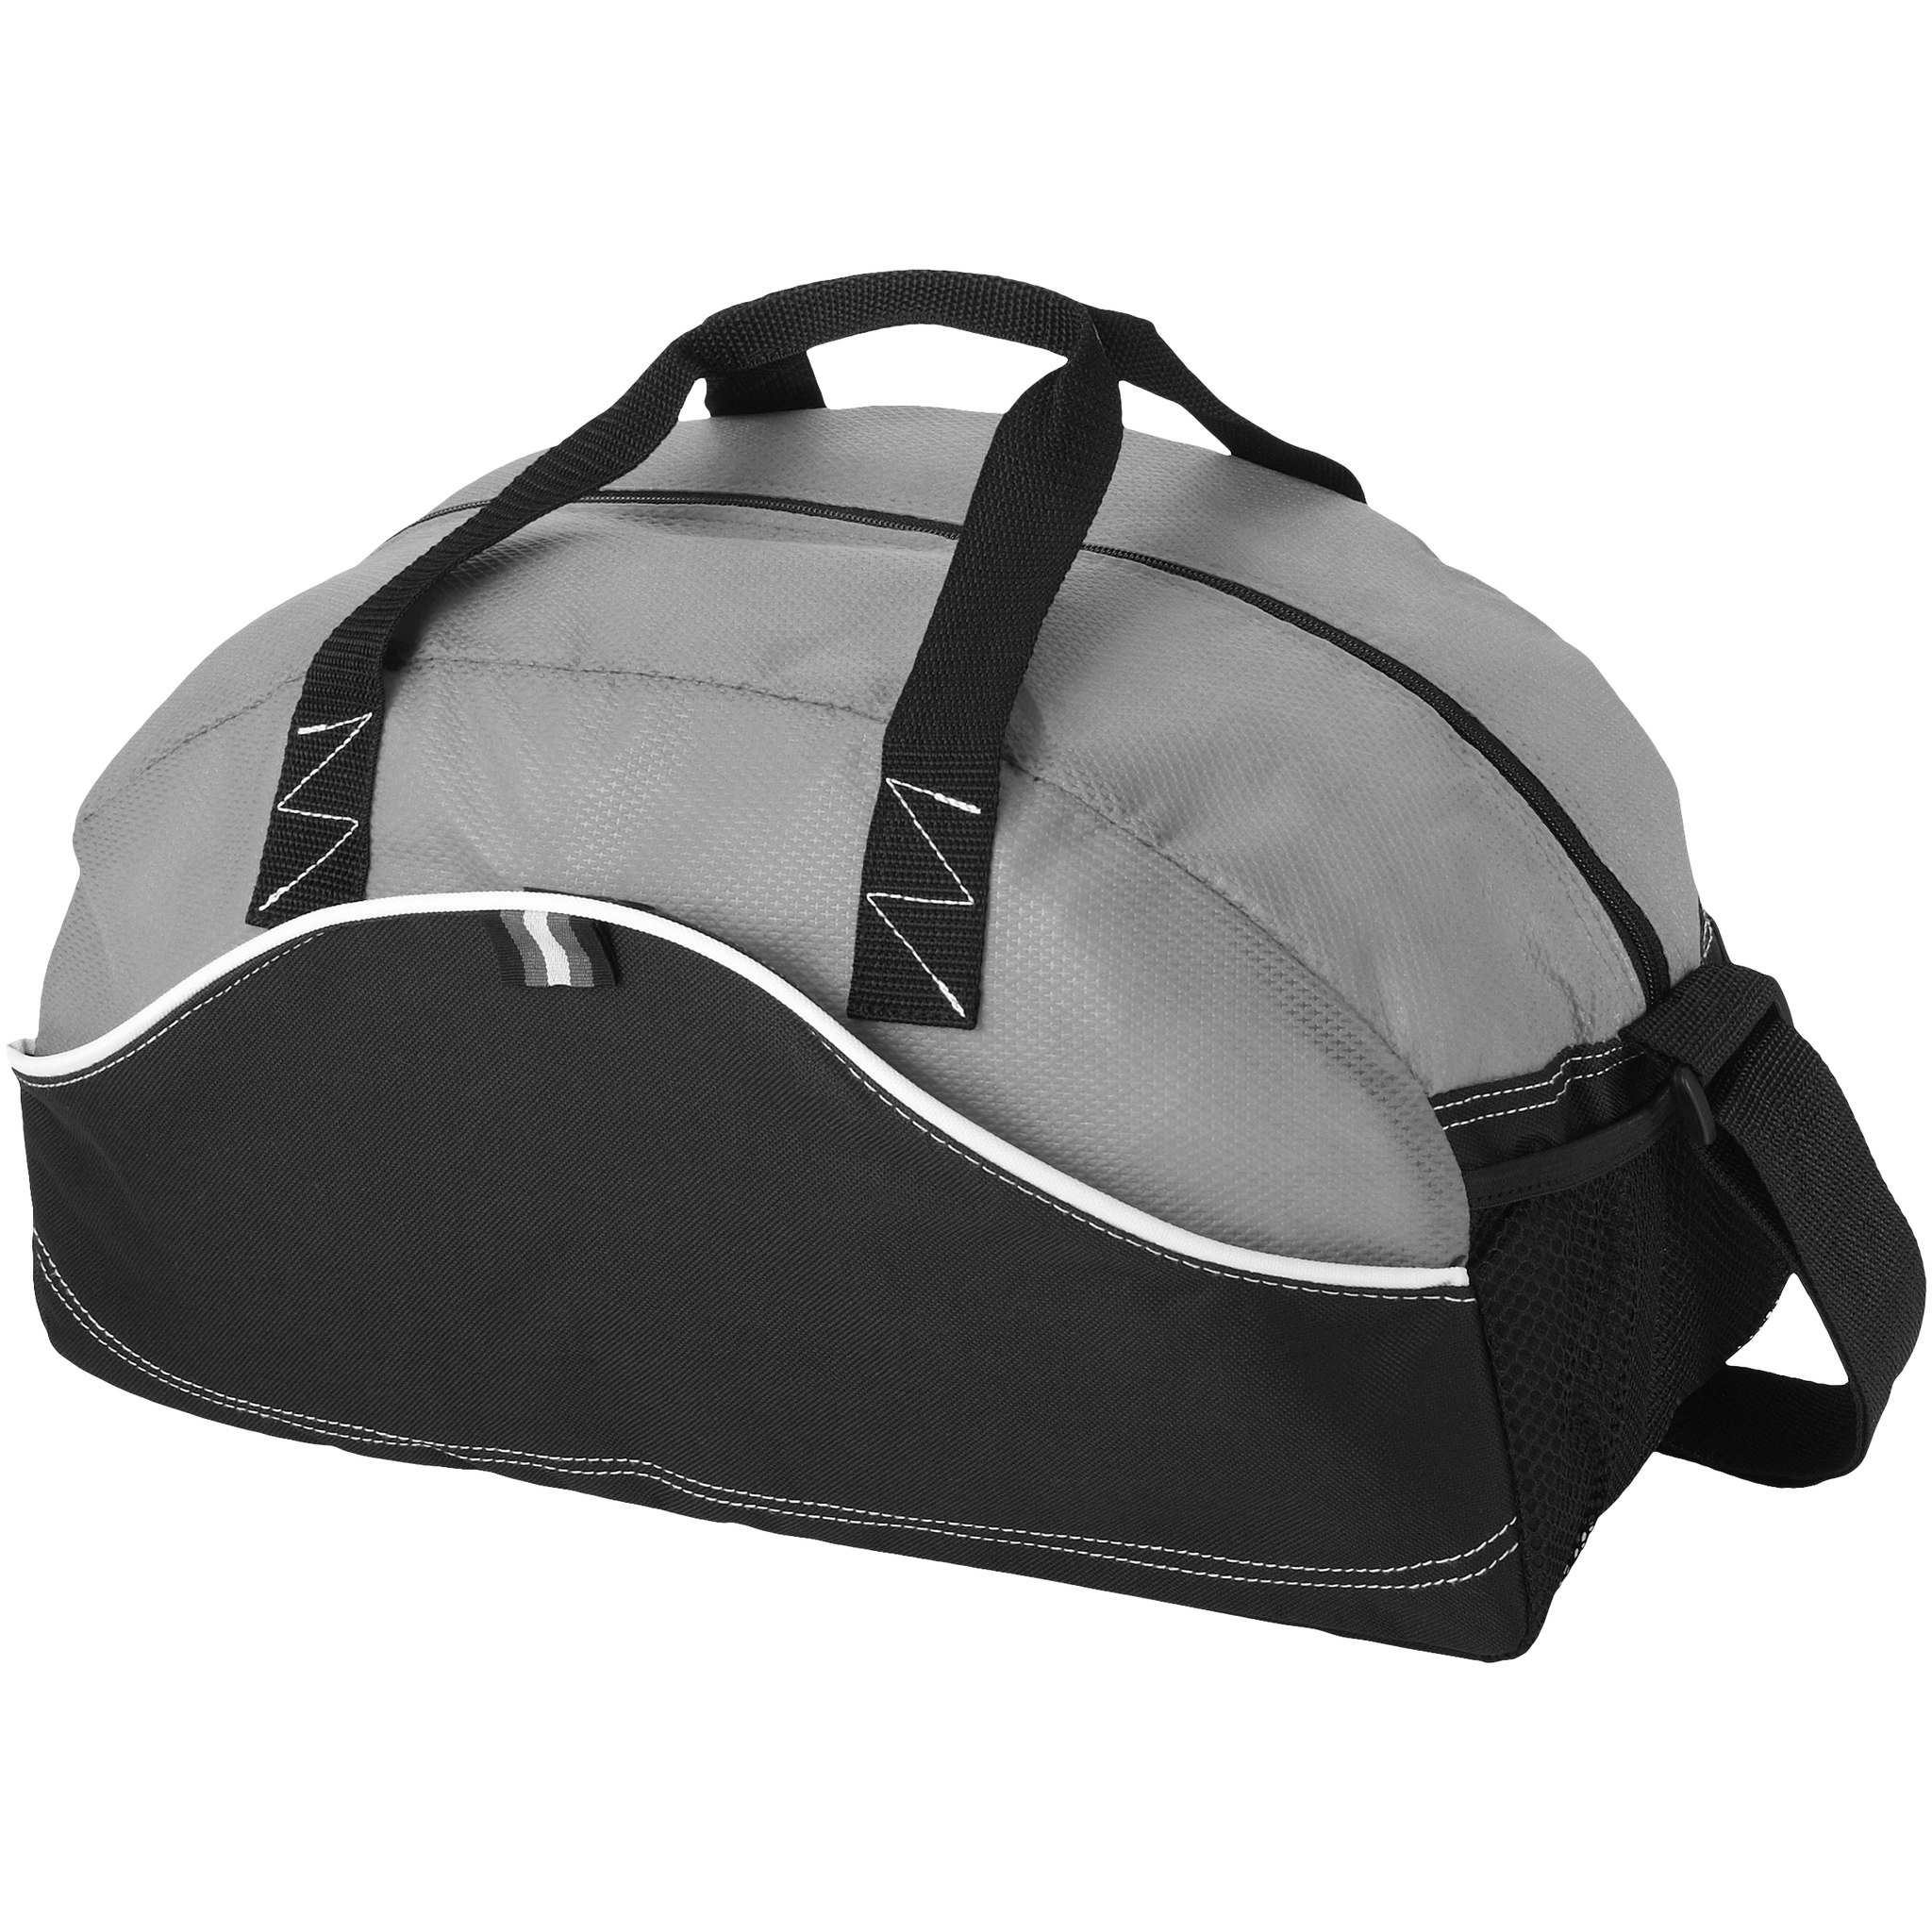 Bullet Boomerang Duffel Bag (44 x 22 x 26 cm) (Solid Black/Light Grey)